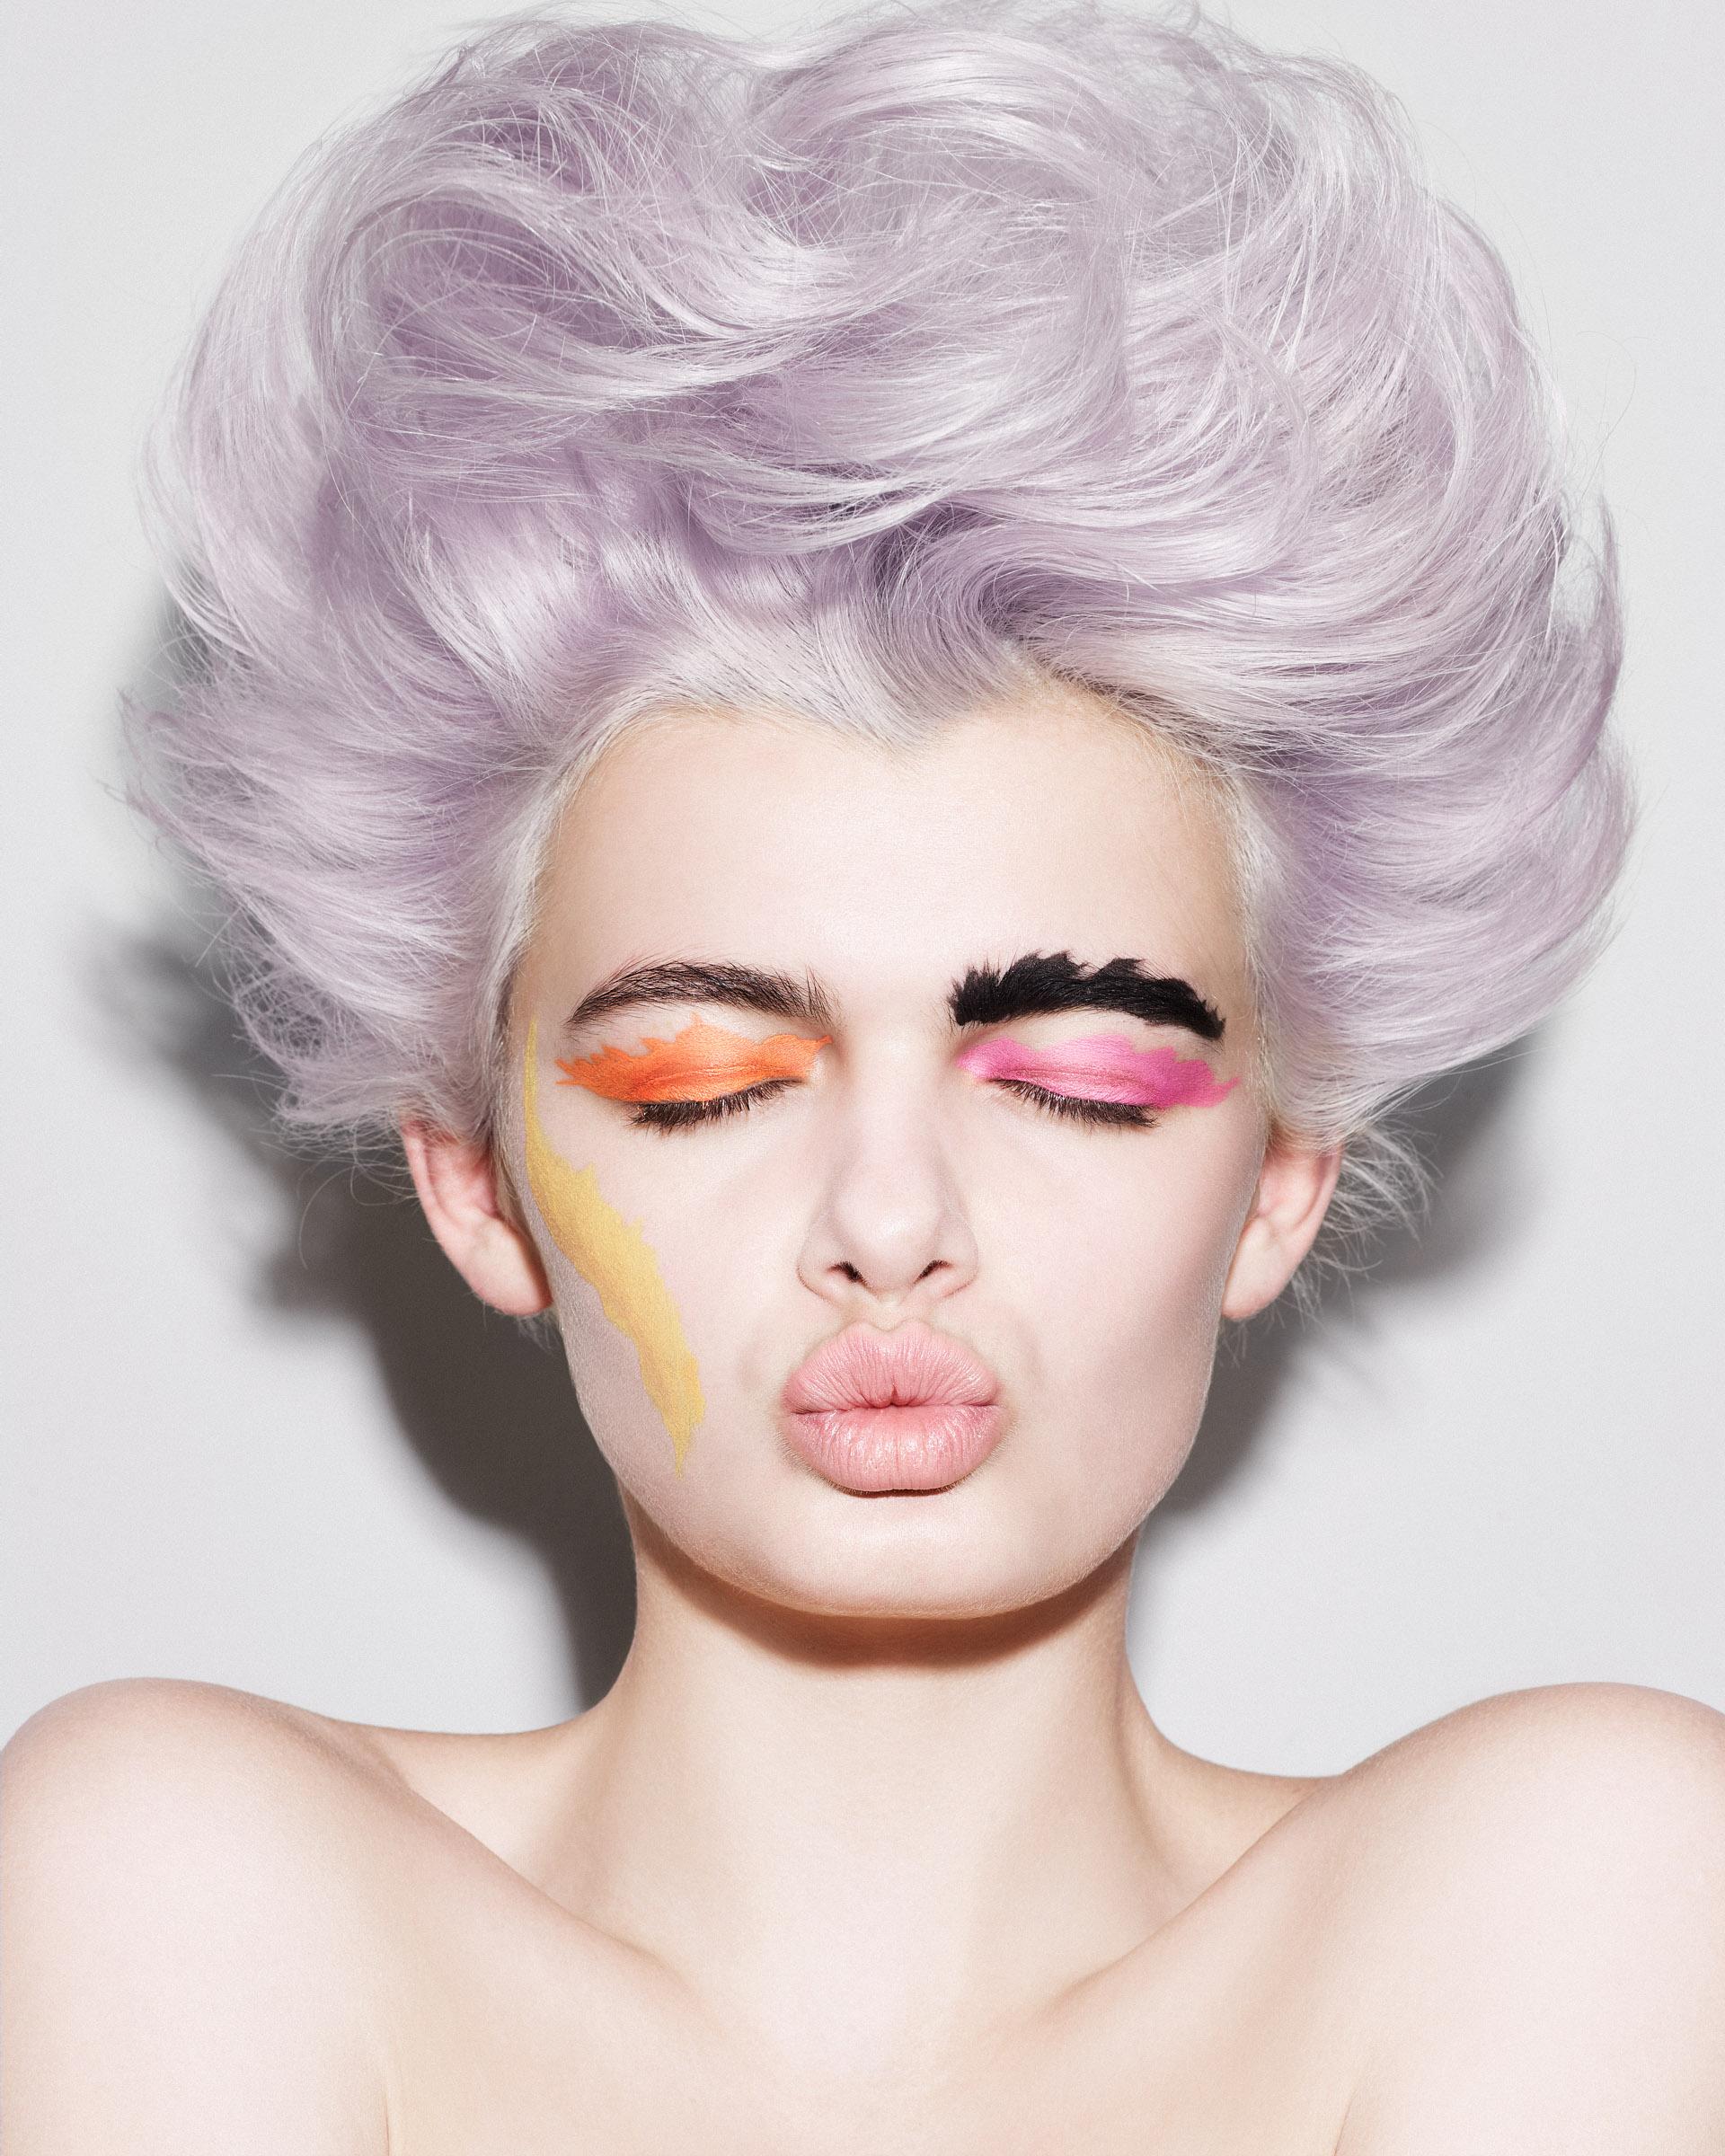 Jack_Eames_Hooker_Young_Colour_Pop_Hair_Beauty_MakeUp_Photography_London_01.jpg